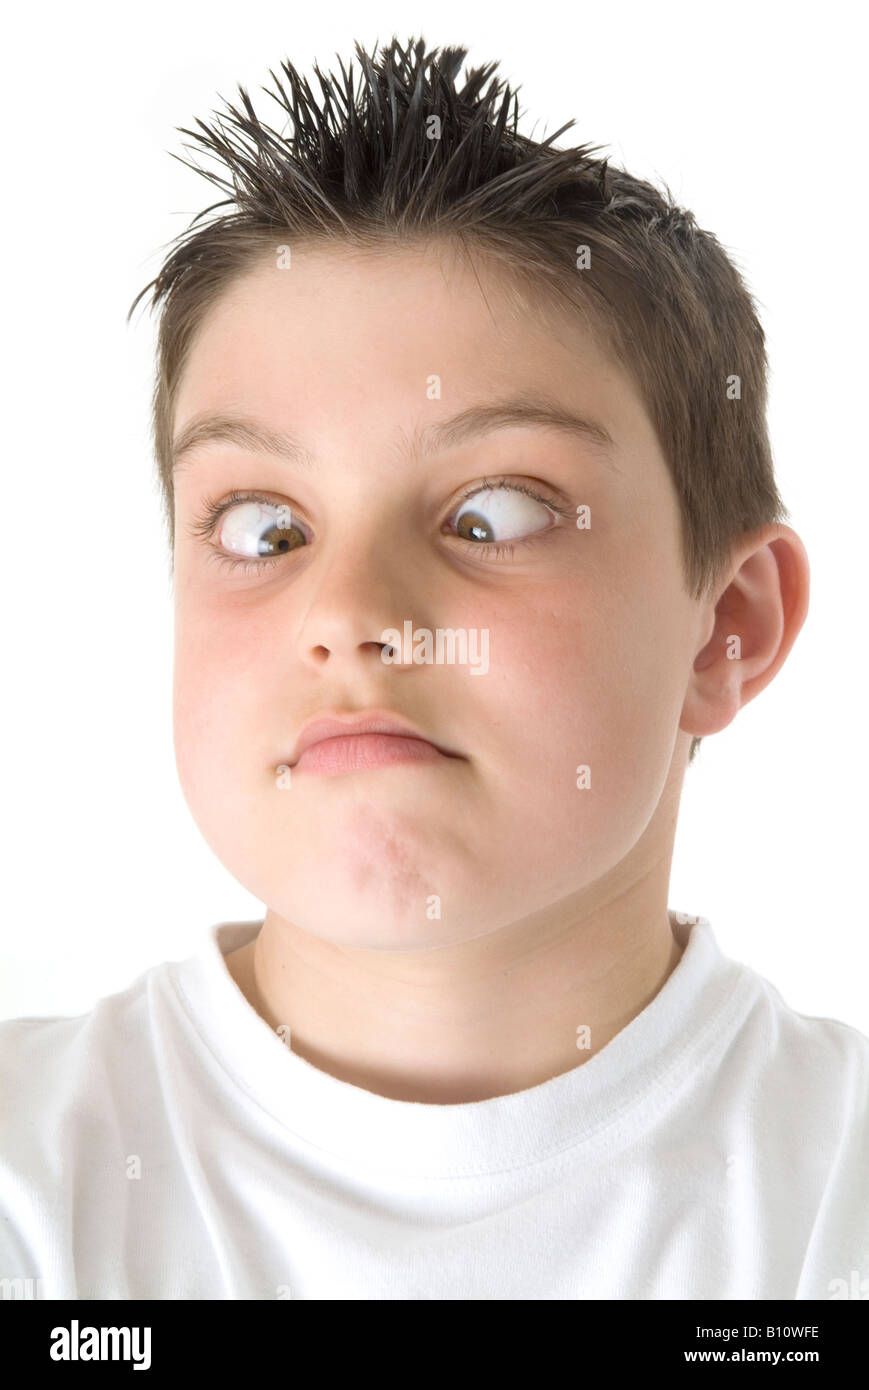 going crosseyed cross eyed boy child kid funny face fun